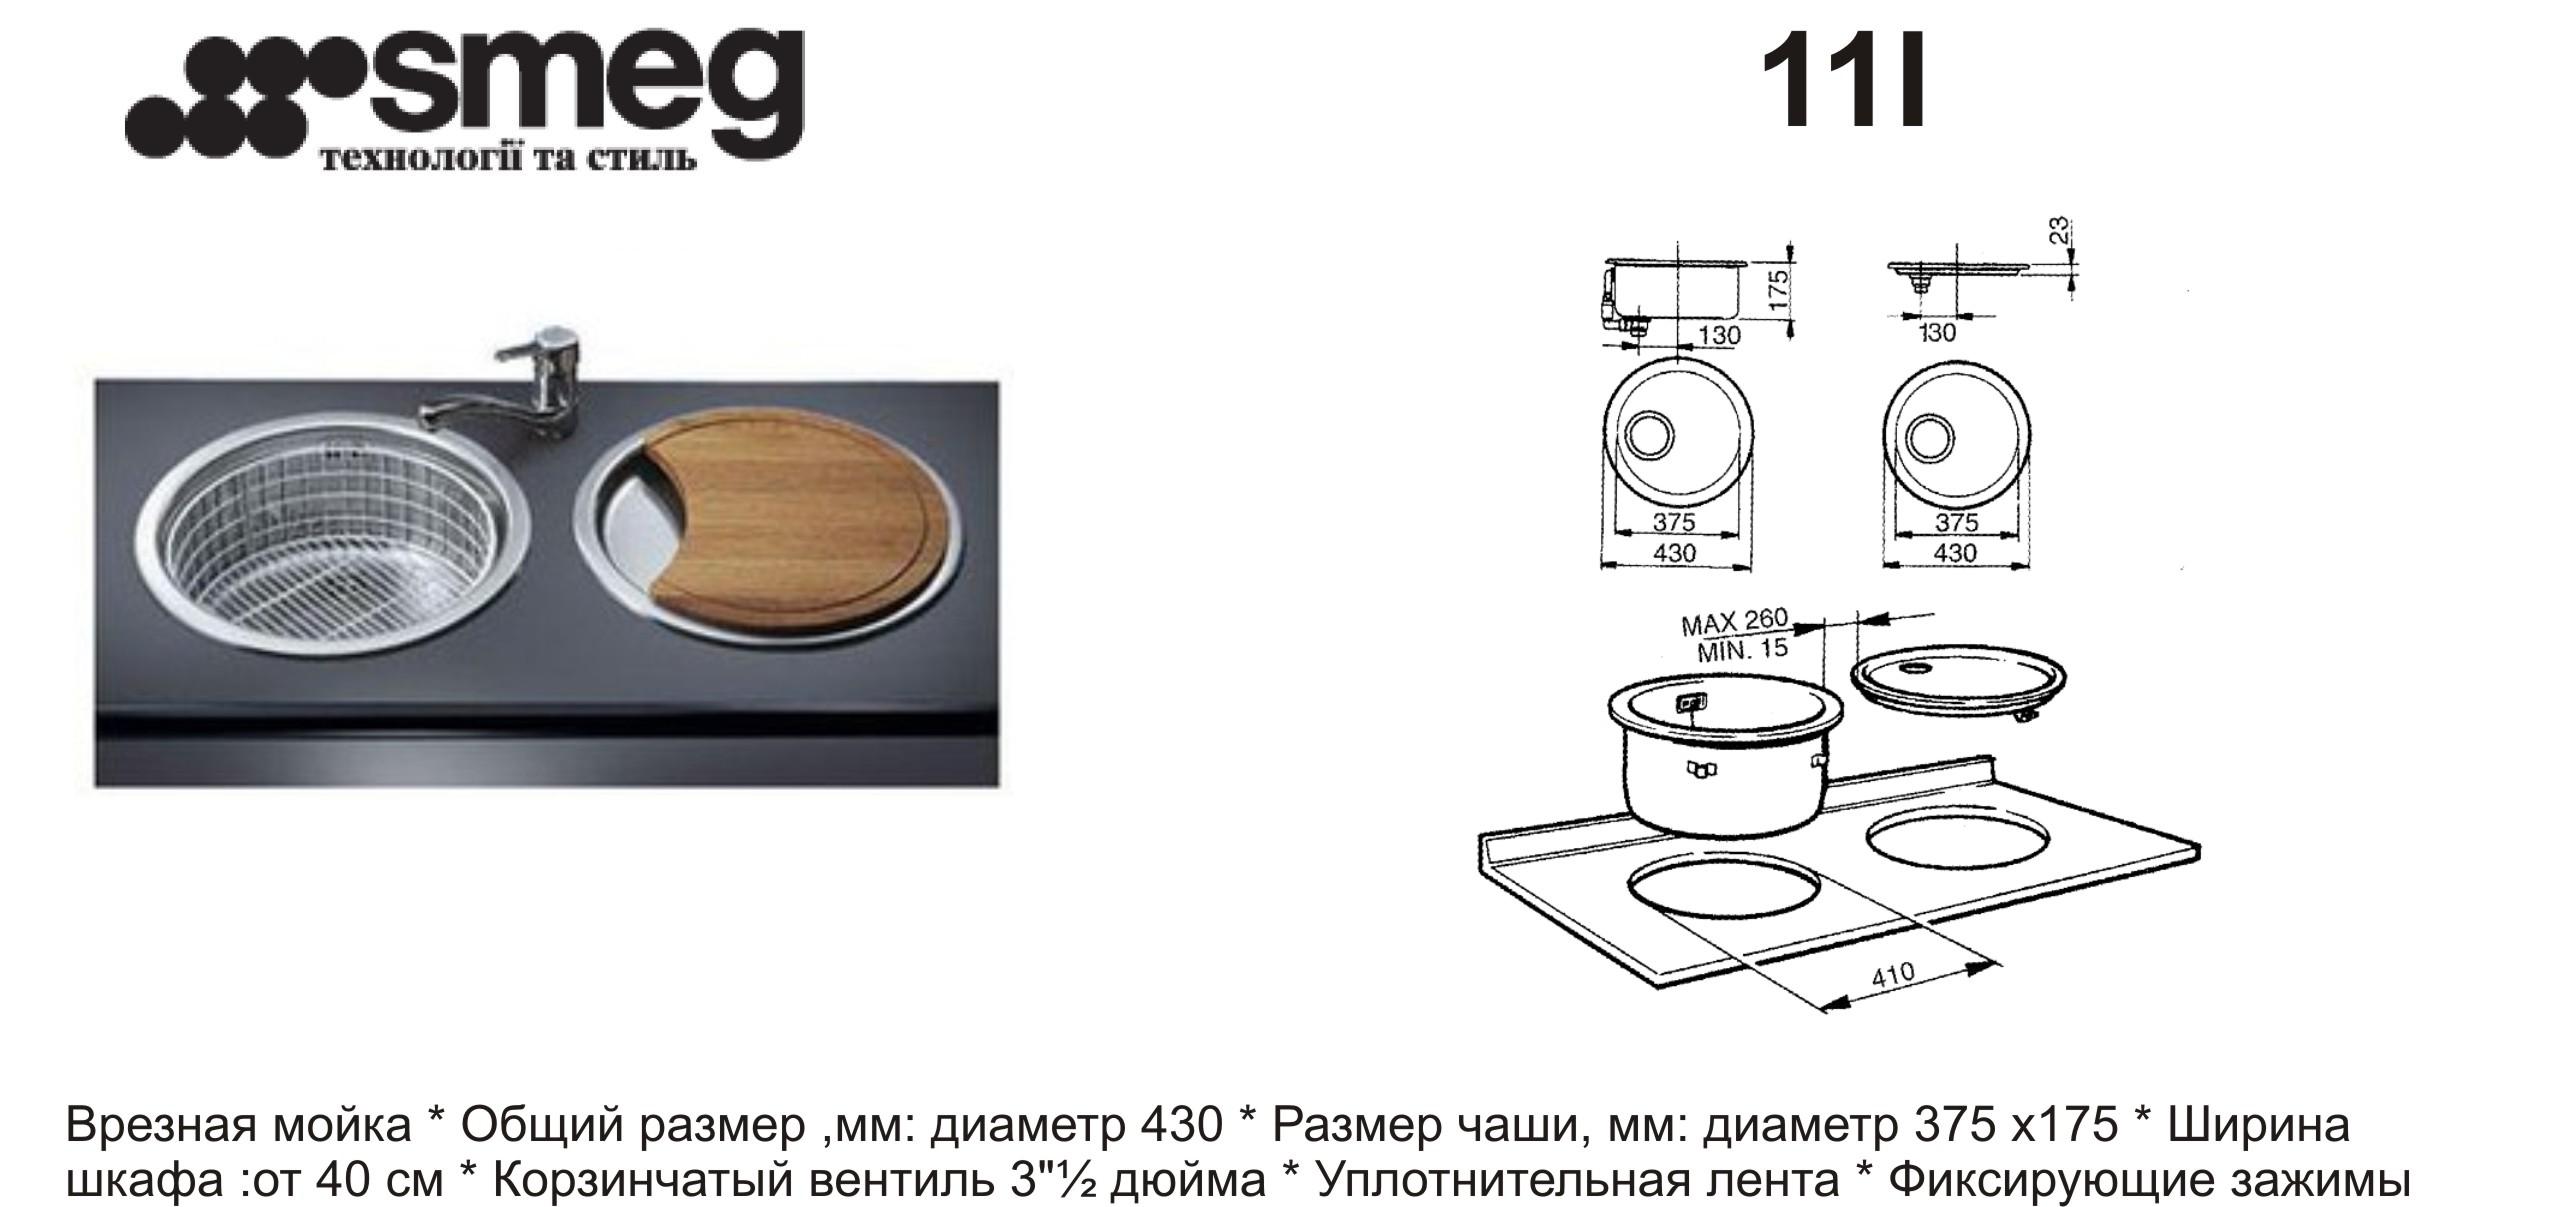 http://www.btmarket.com.ua/img_upl2/11I_1.jpg